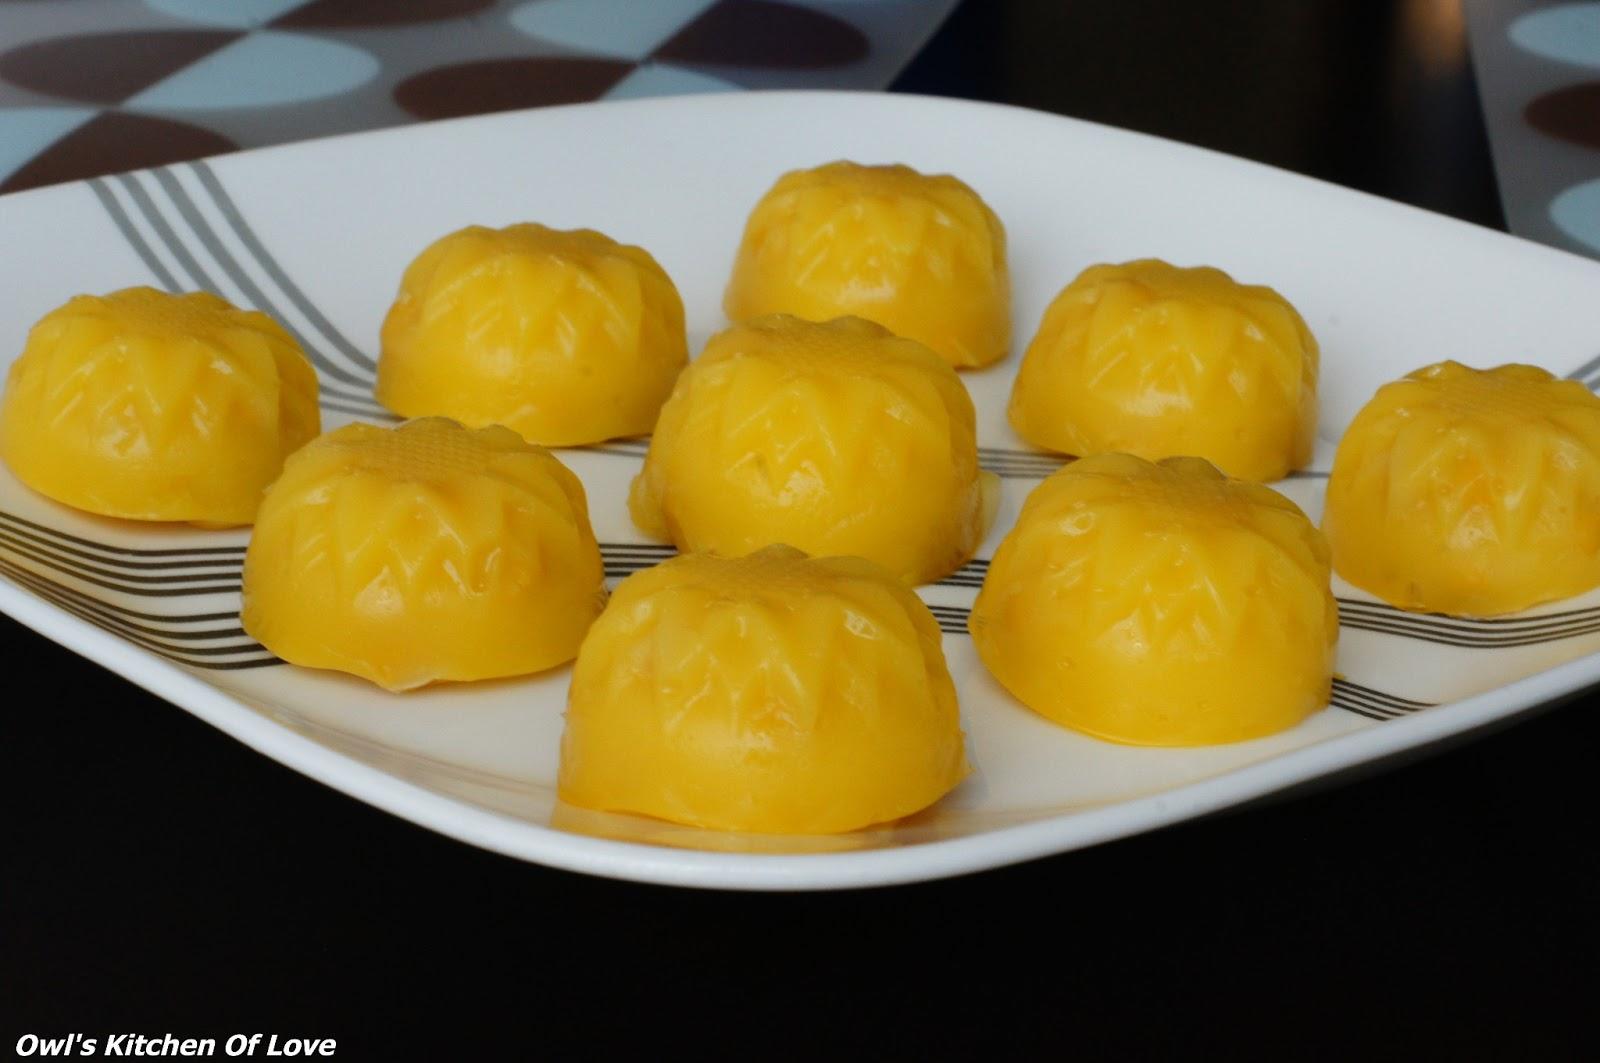 ஜ۩۞۩ஜ Vanessa の 温馨厨房 ஜ۩۞۩ஜ Corn Kueh Jagung Kueh 粟米糕